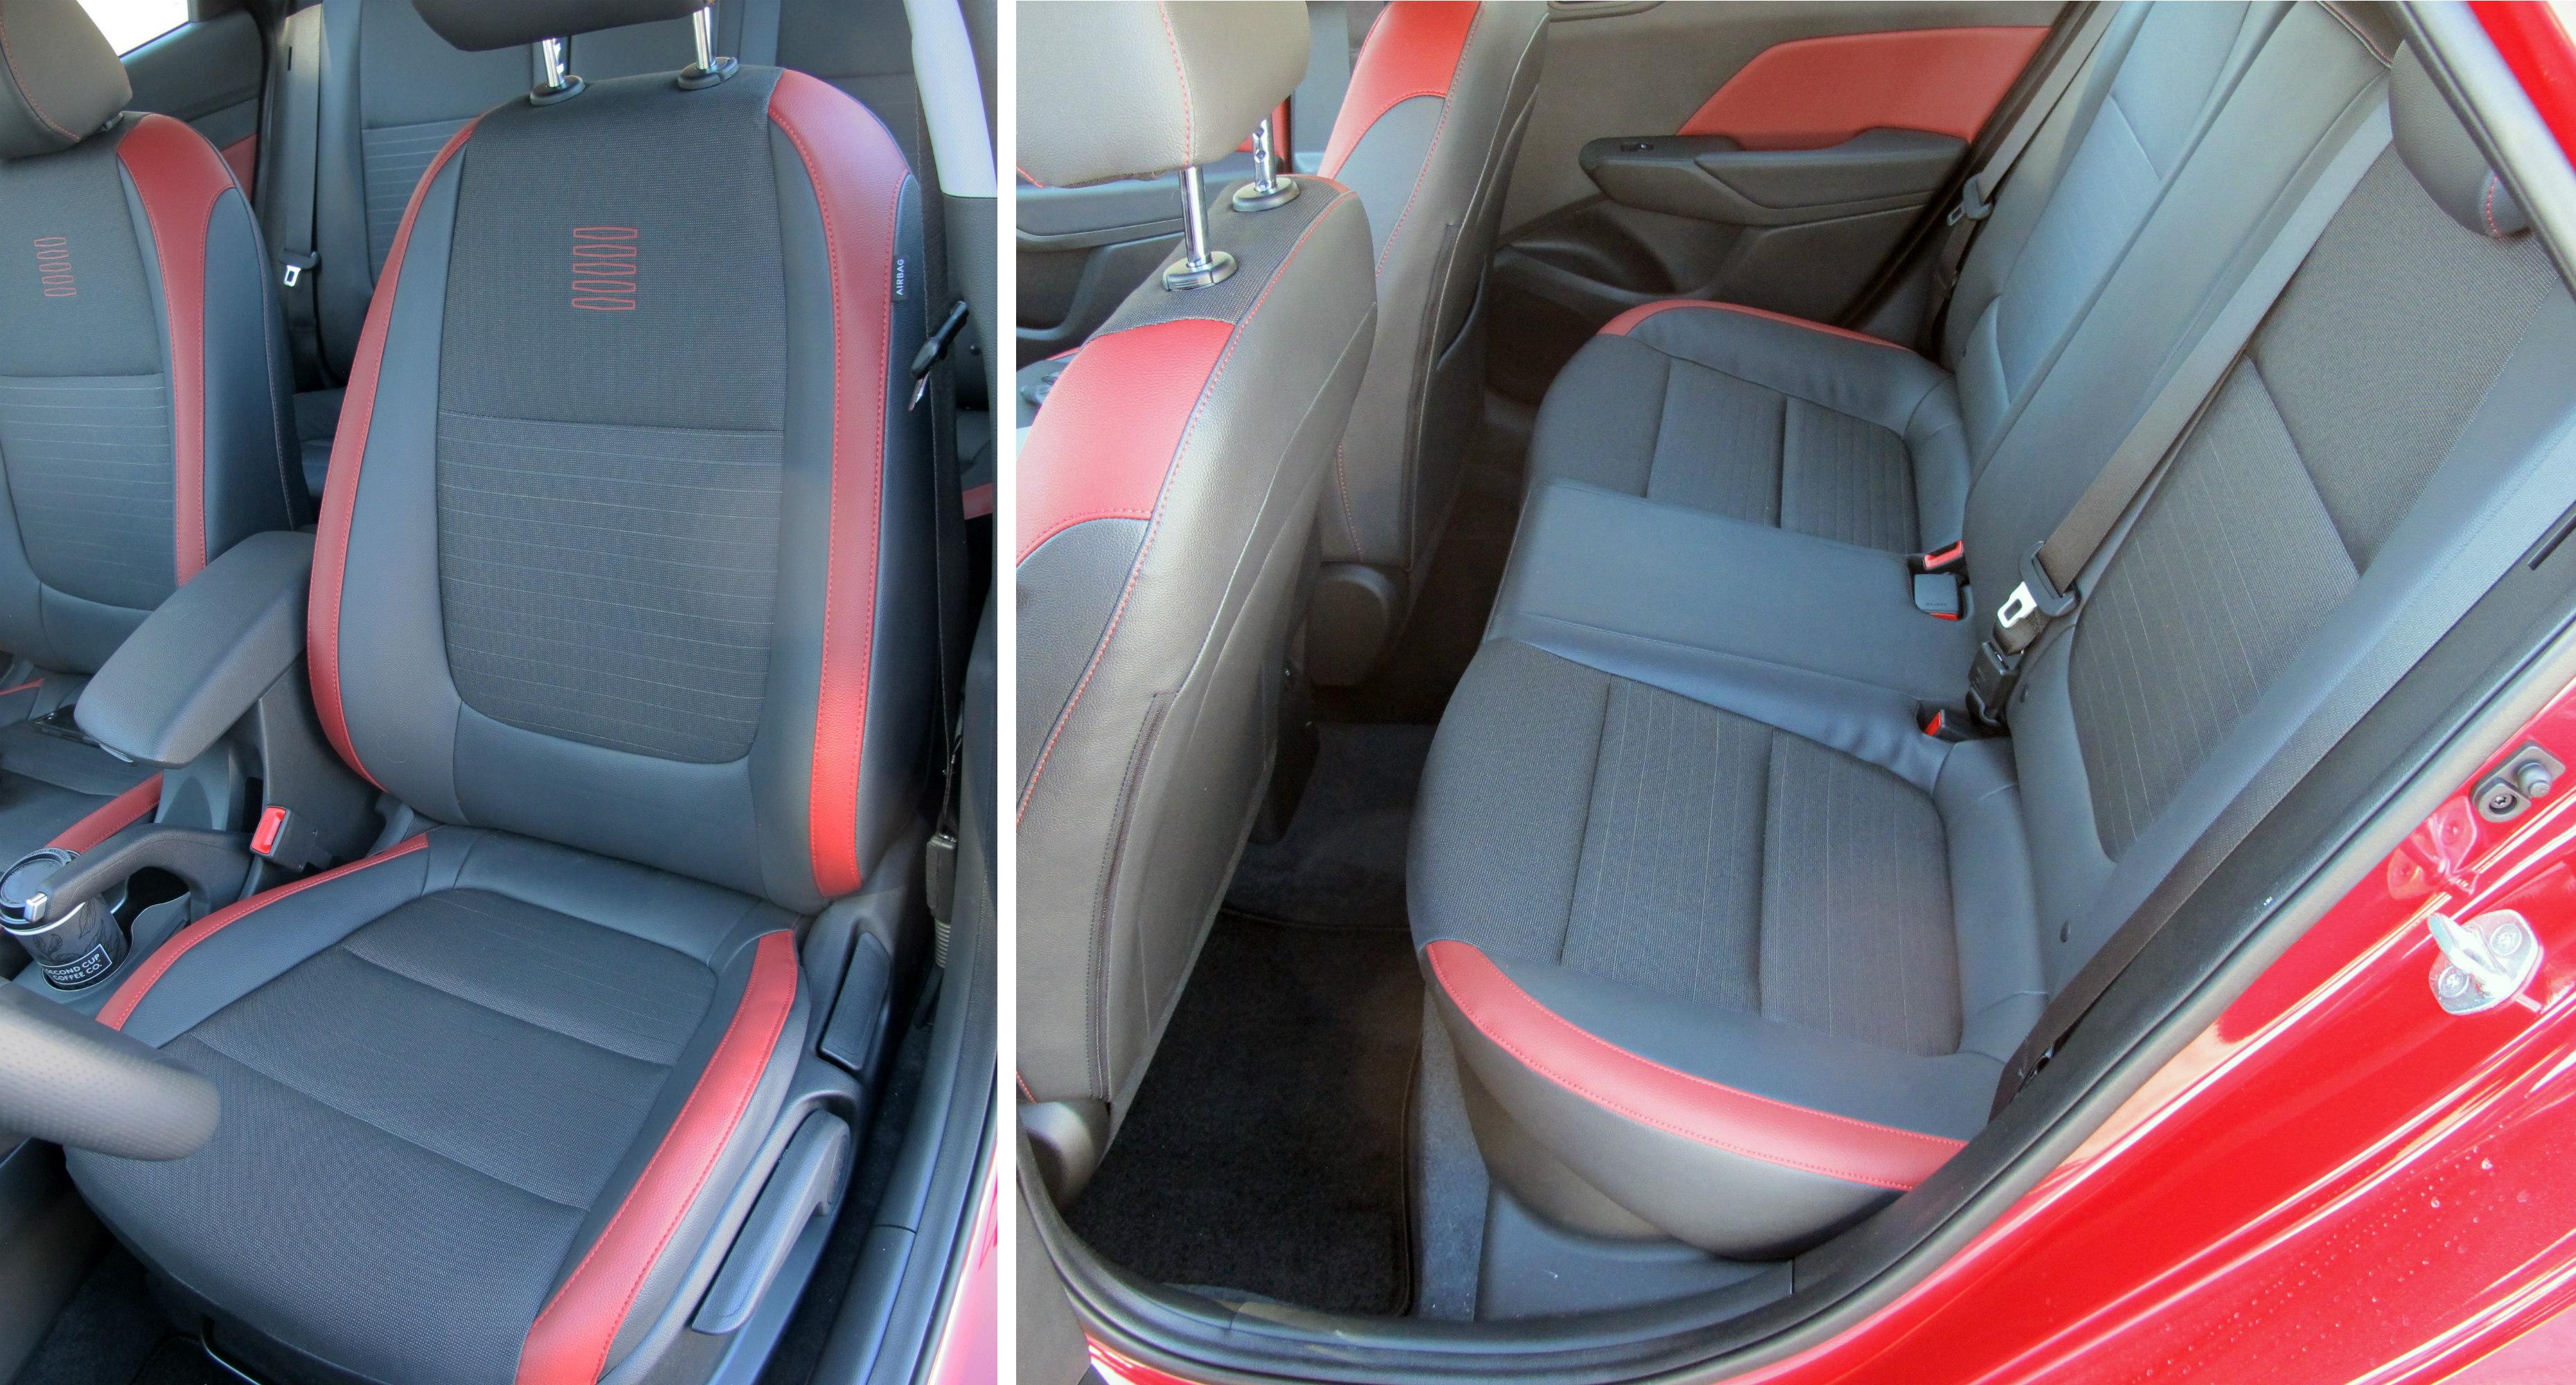 Hyundai Accent Gls Hatch Surprises On Many Levels Wheels Ca